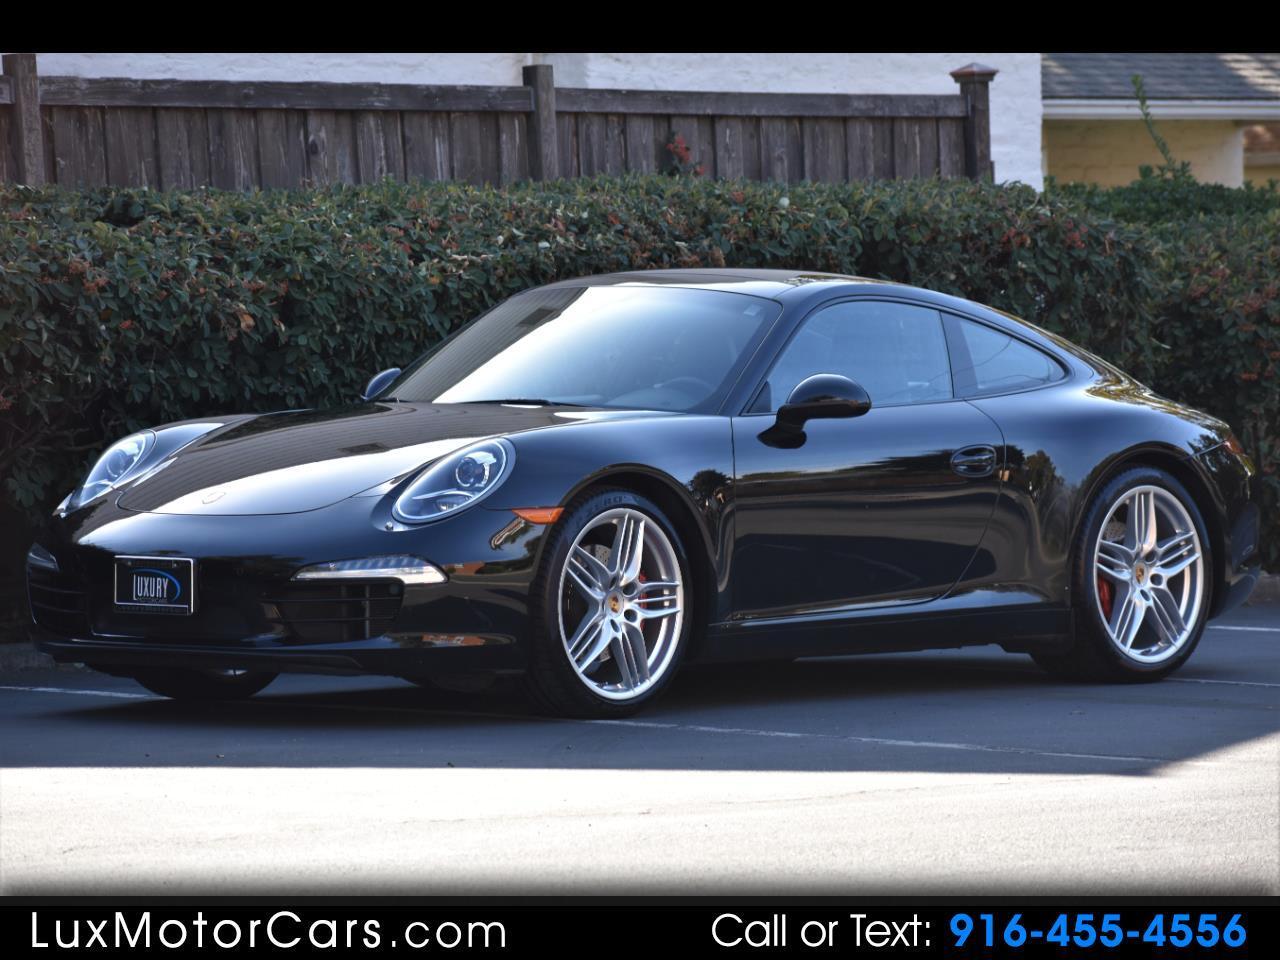 2013 Porsche 911 Carrera S Coupe